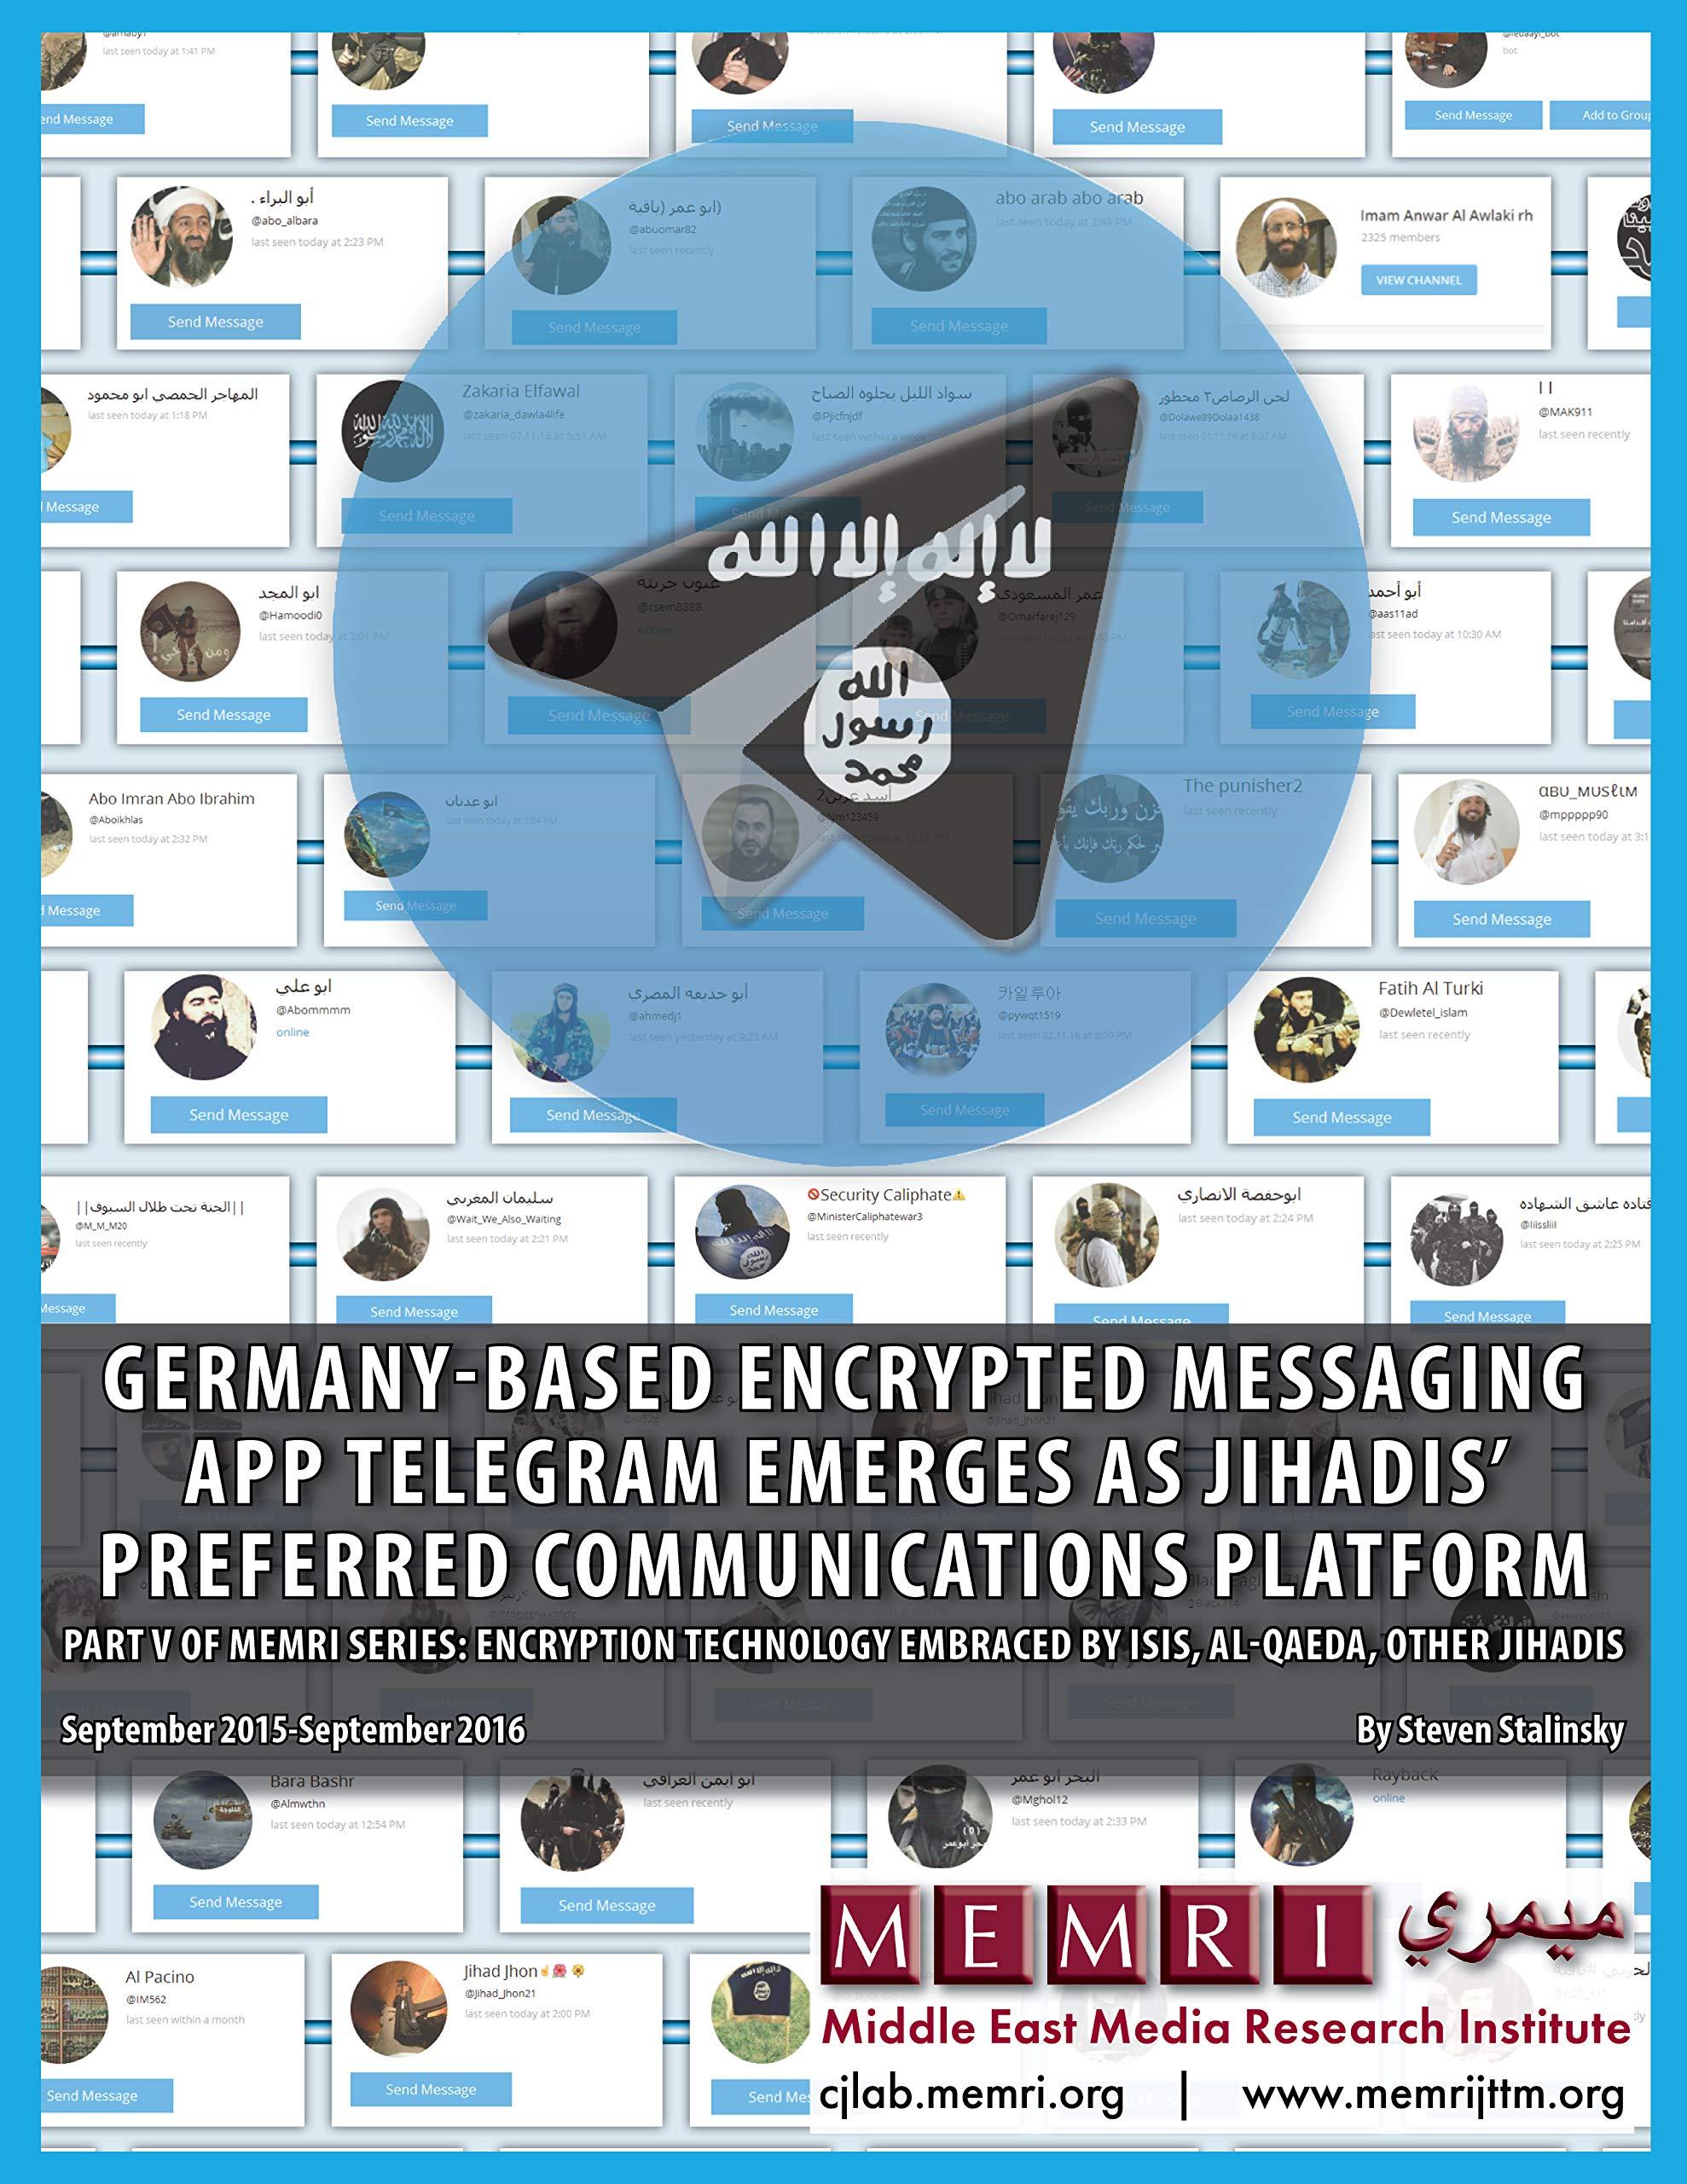 Germany-based Encrypted Messaging App Telegram Emerges as Jihadis' Preferred Communications Platform: Part V of MEMRI Series: Encryption Technology Embraced by ISIS, Al-Qaeda, Other Jihadis